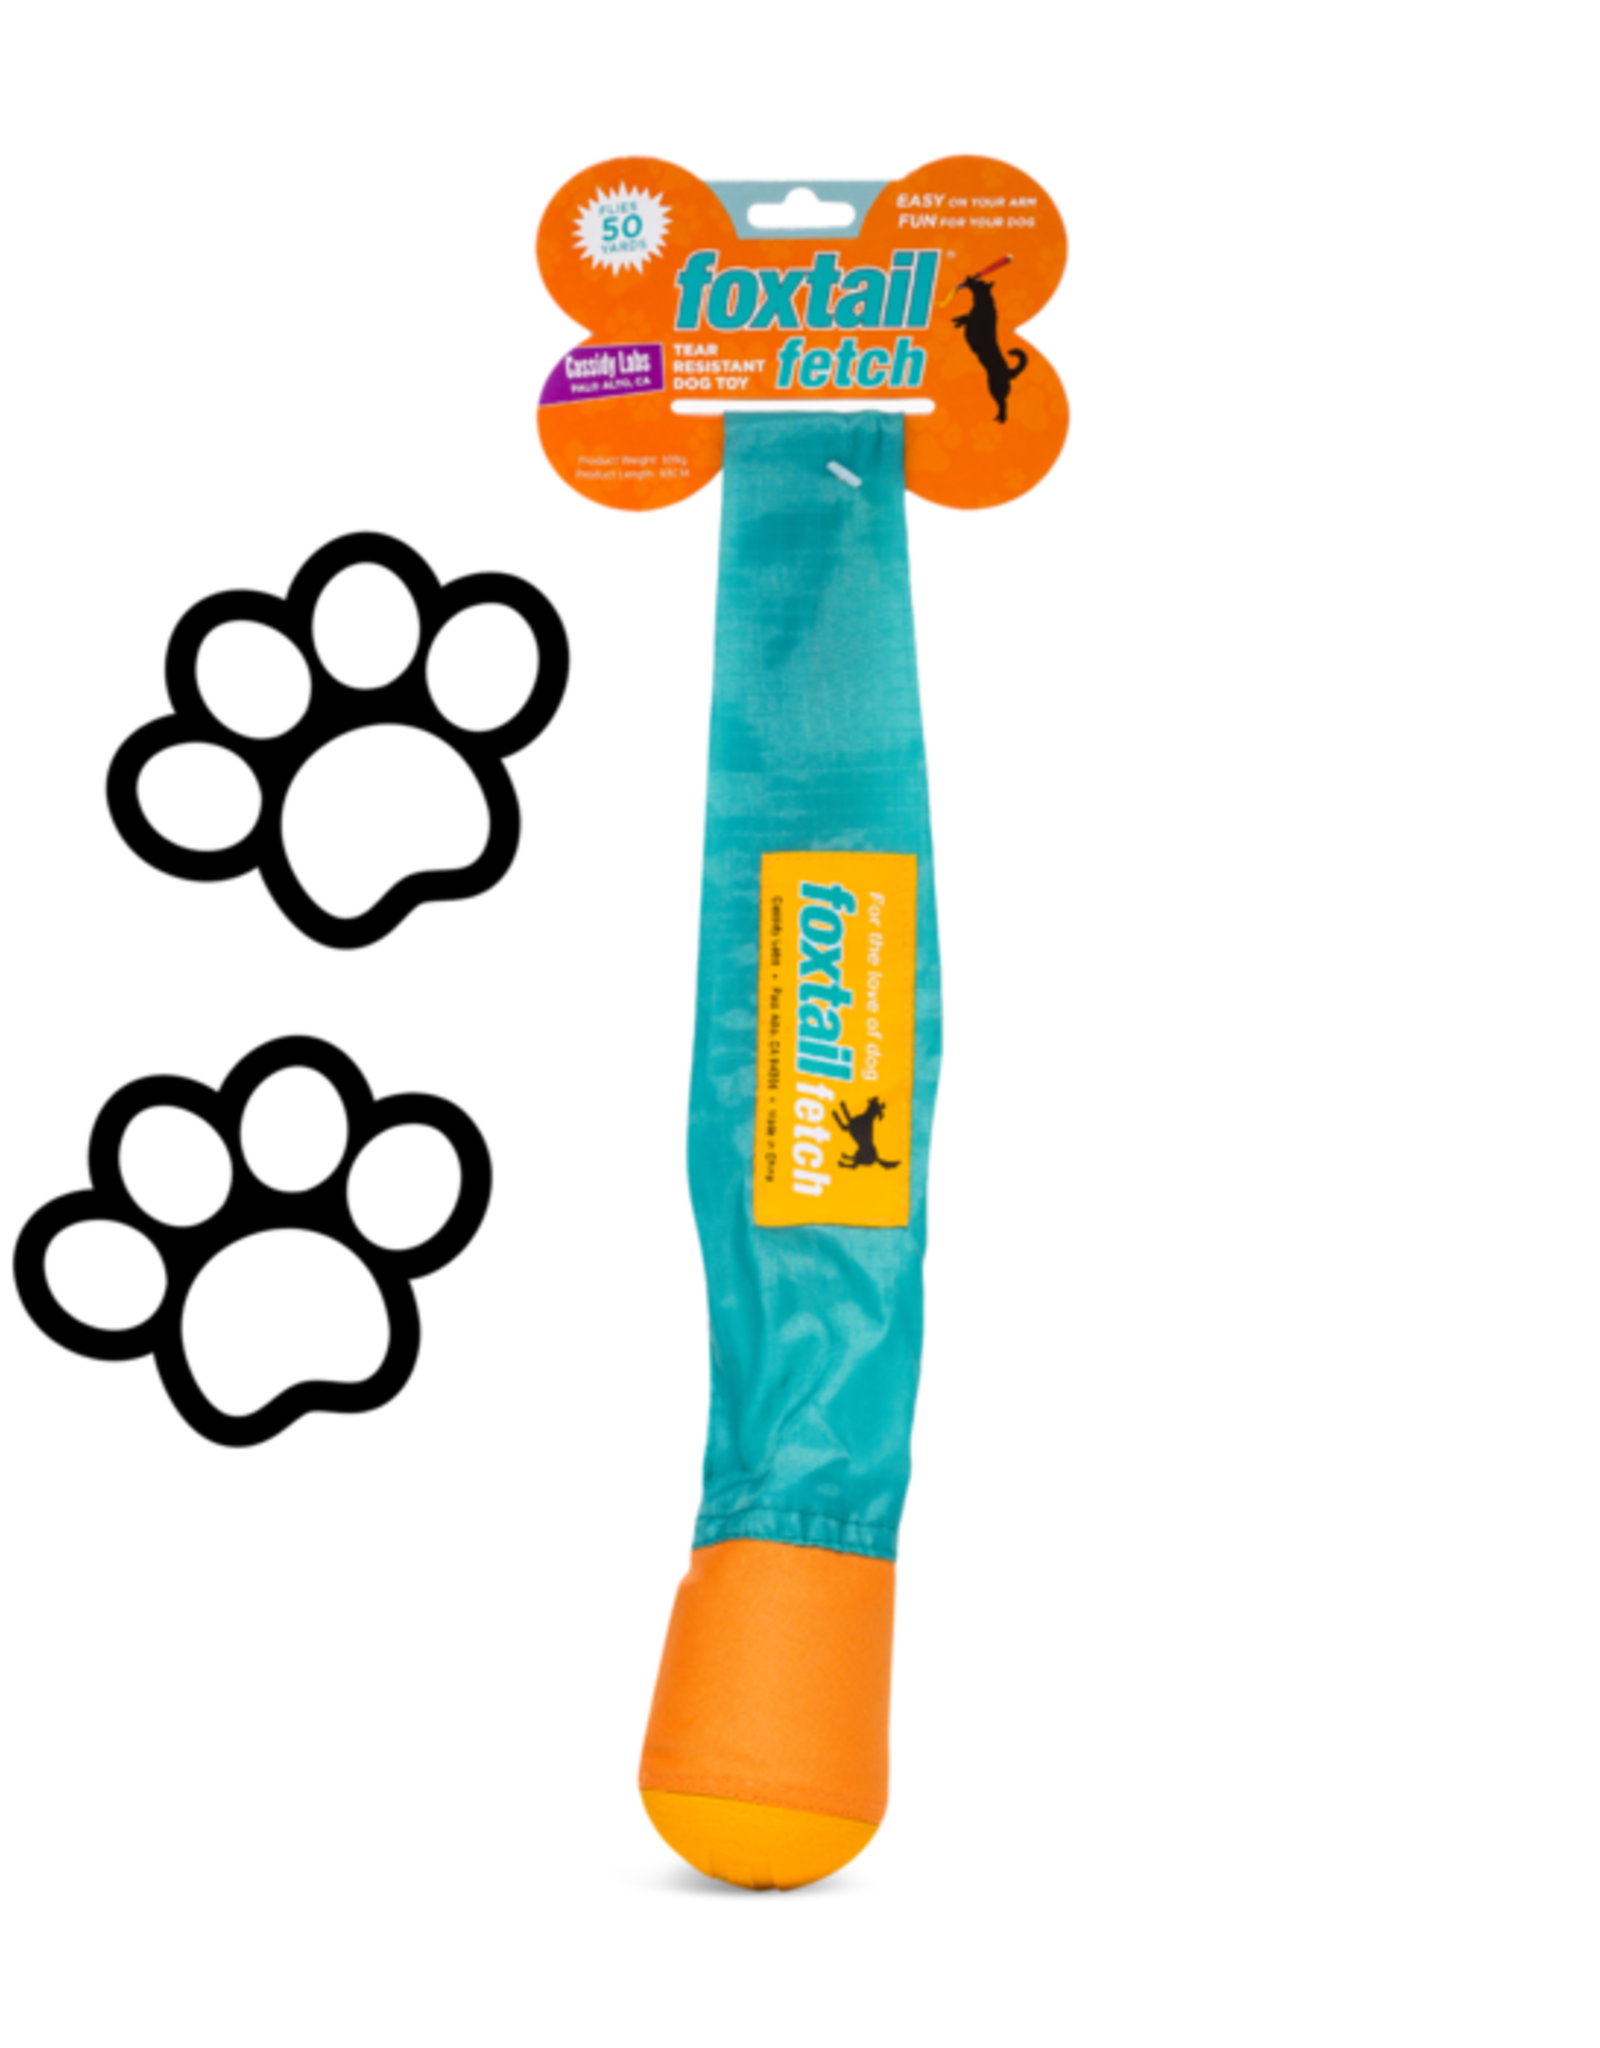 Foxtail-Fetch